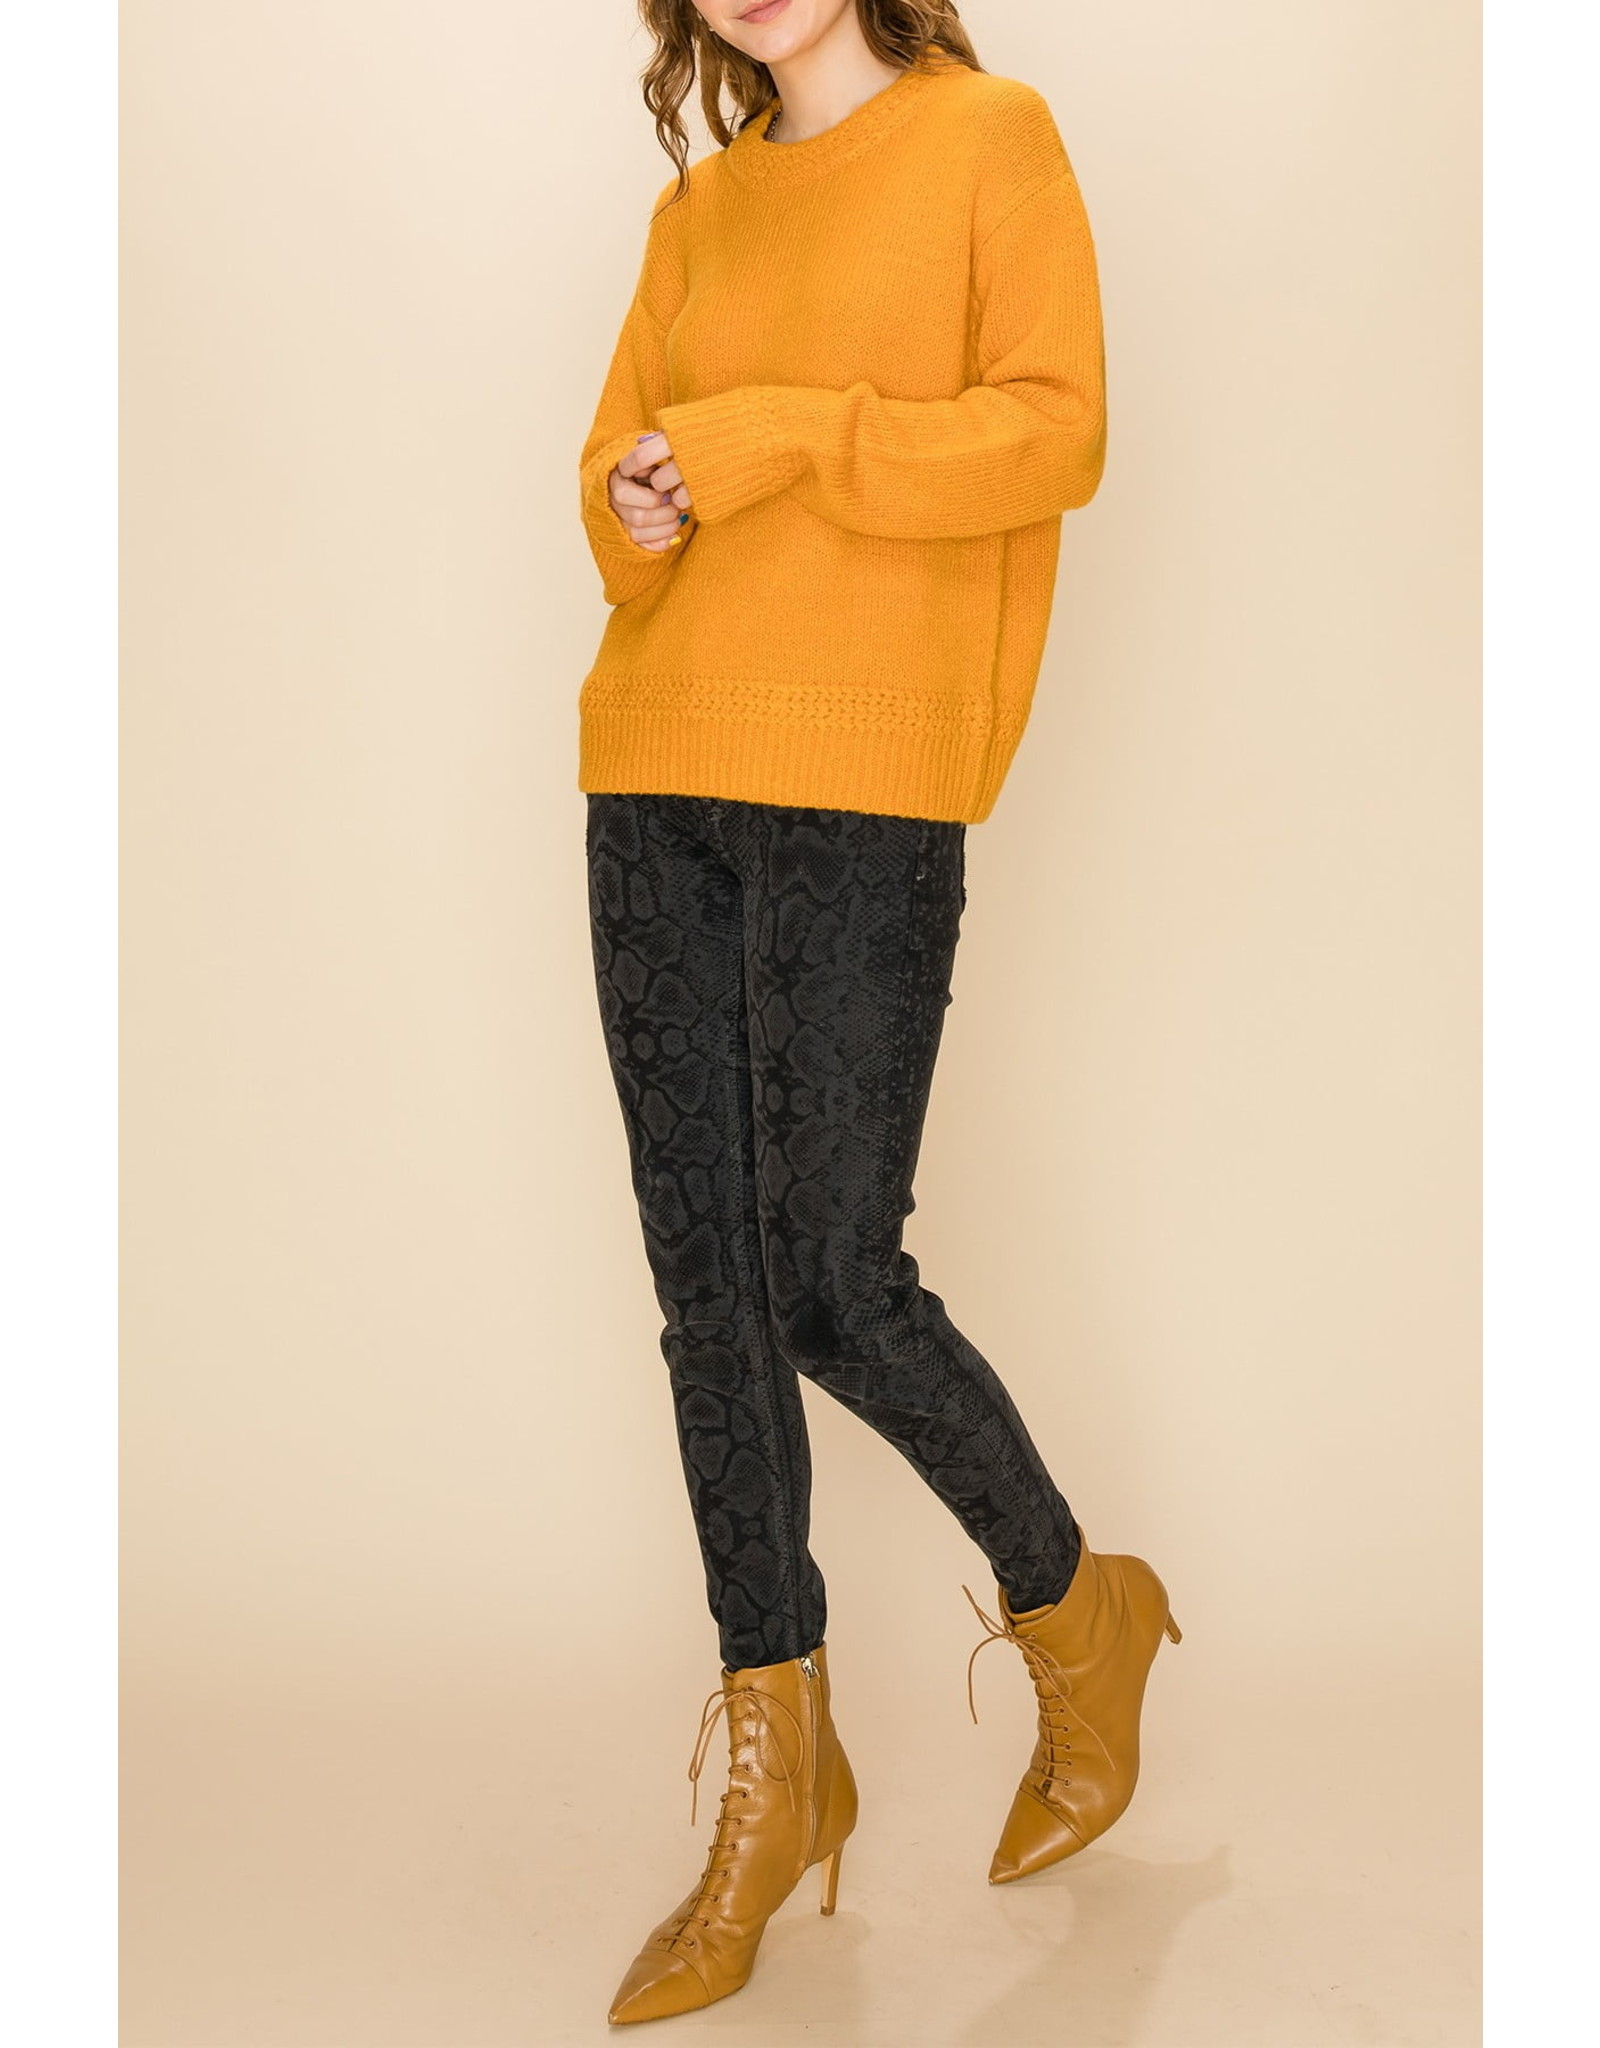 Bonanza - Every Day Sweater Long Sleeve